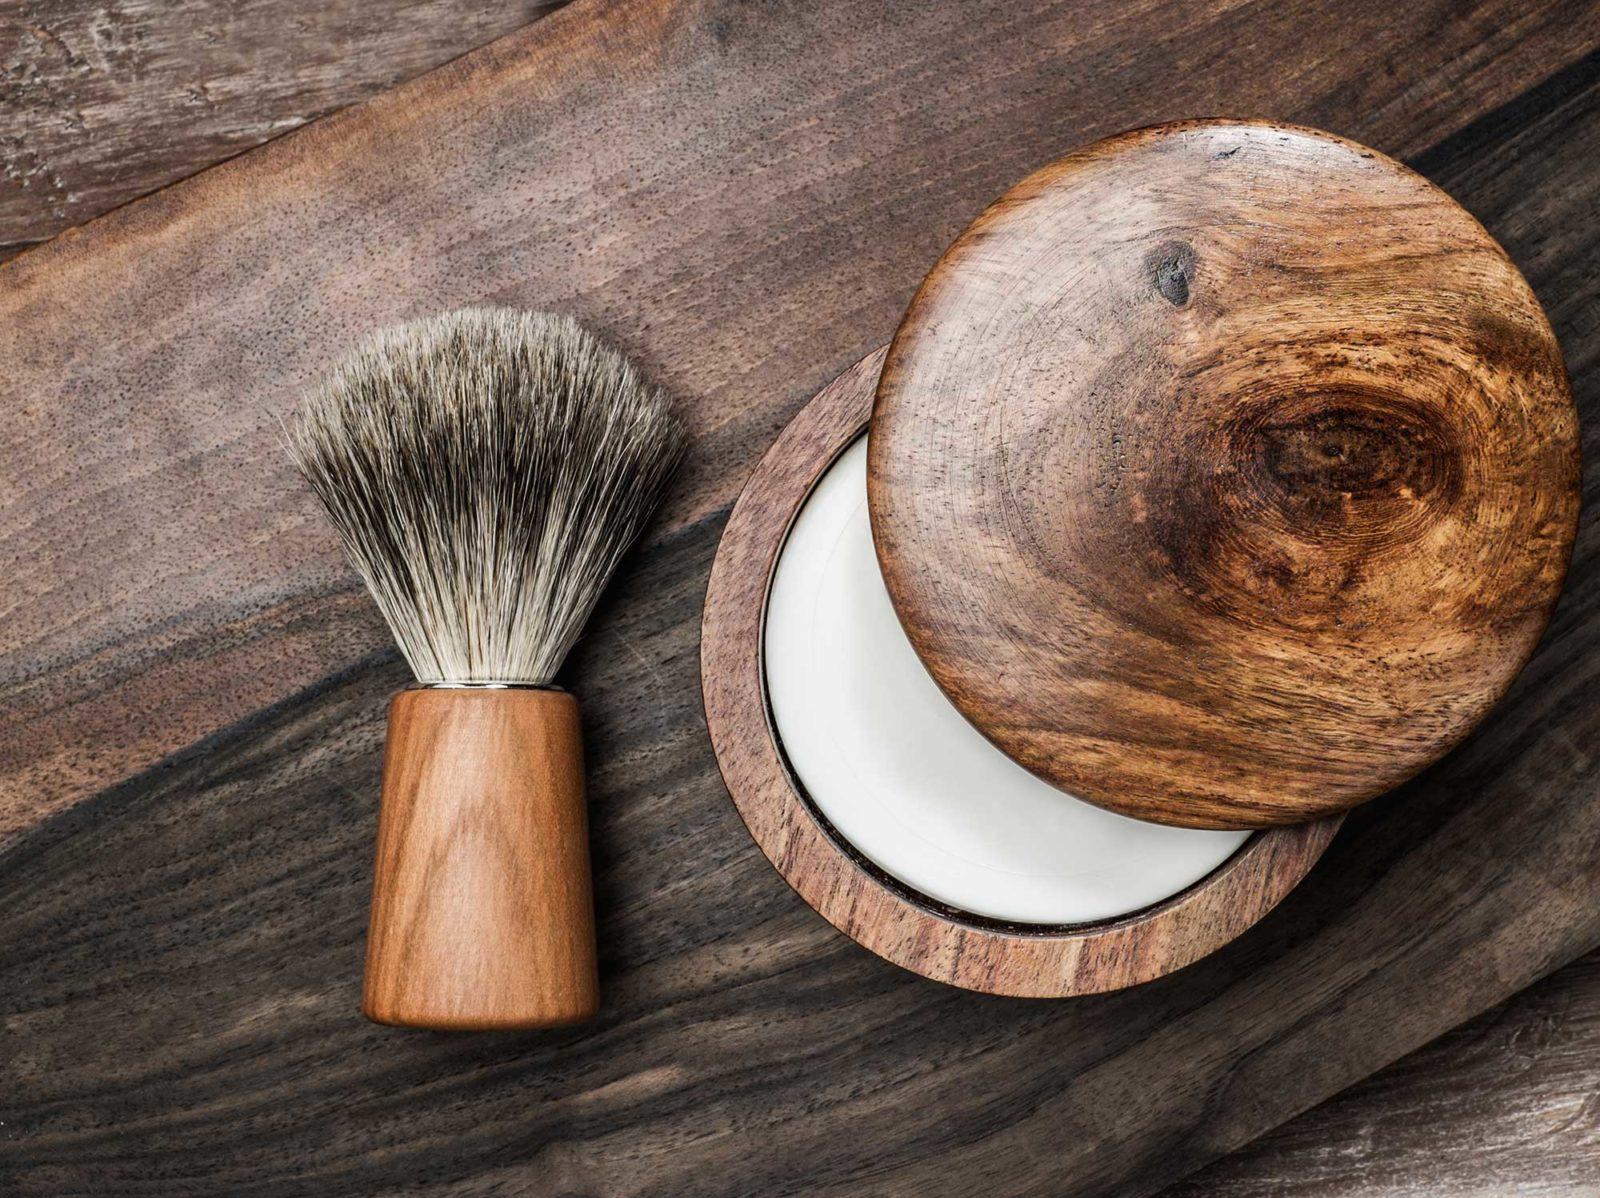 Помазок и мыло для бритья